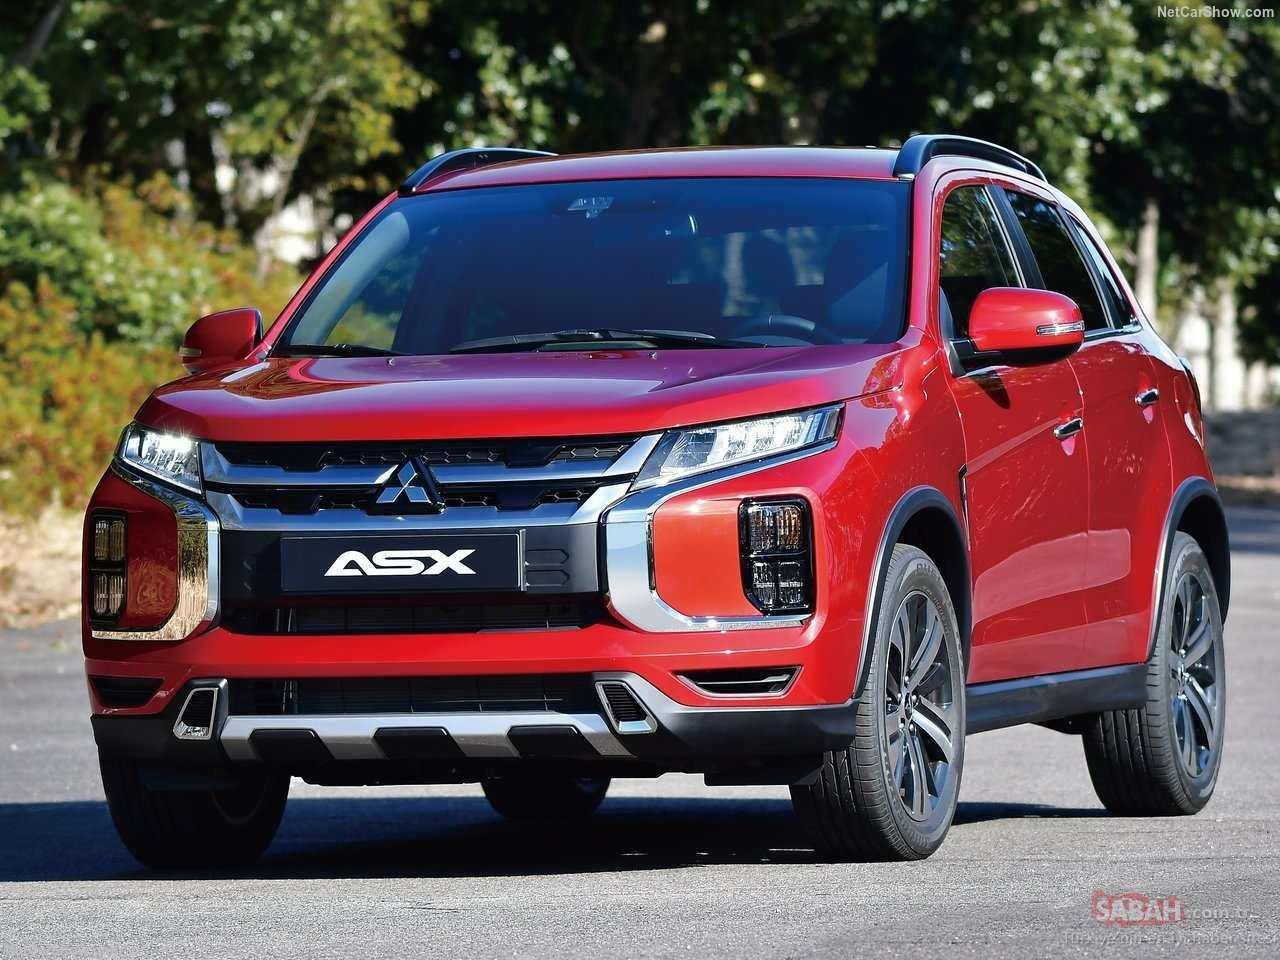 40 Concept of Neue Mitsubishi Modelle Bis 2020 Interior for Neue Mitsubishi Modelle Bis 2020